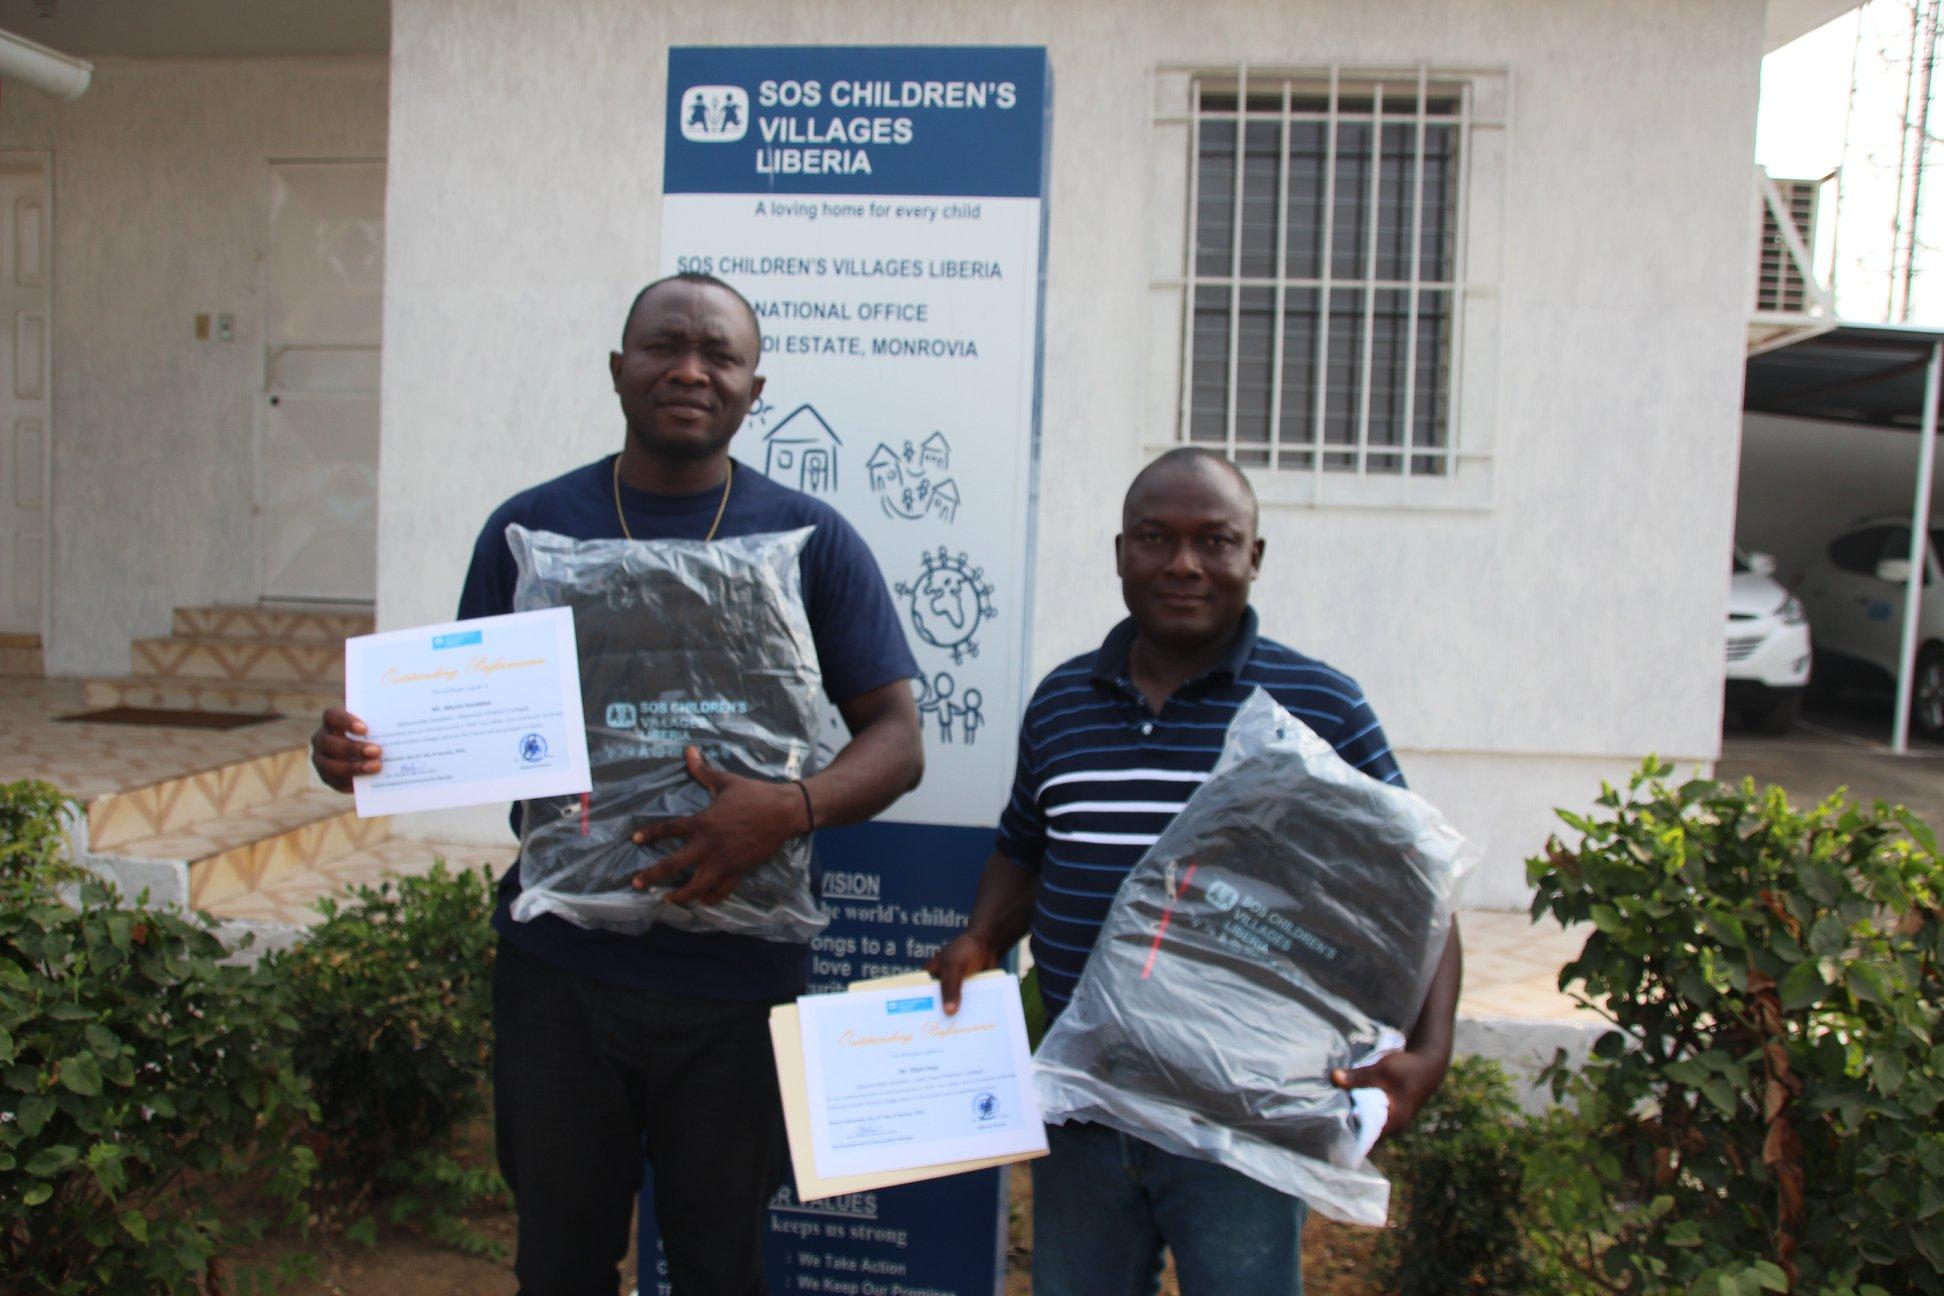 SOS Children's Villages Liberia Sponsorship team receives recognition for good performance